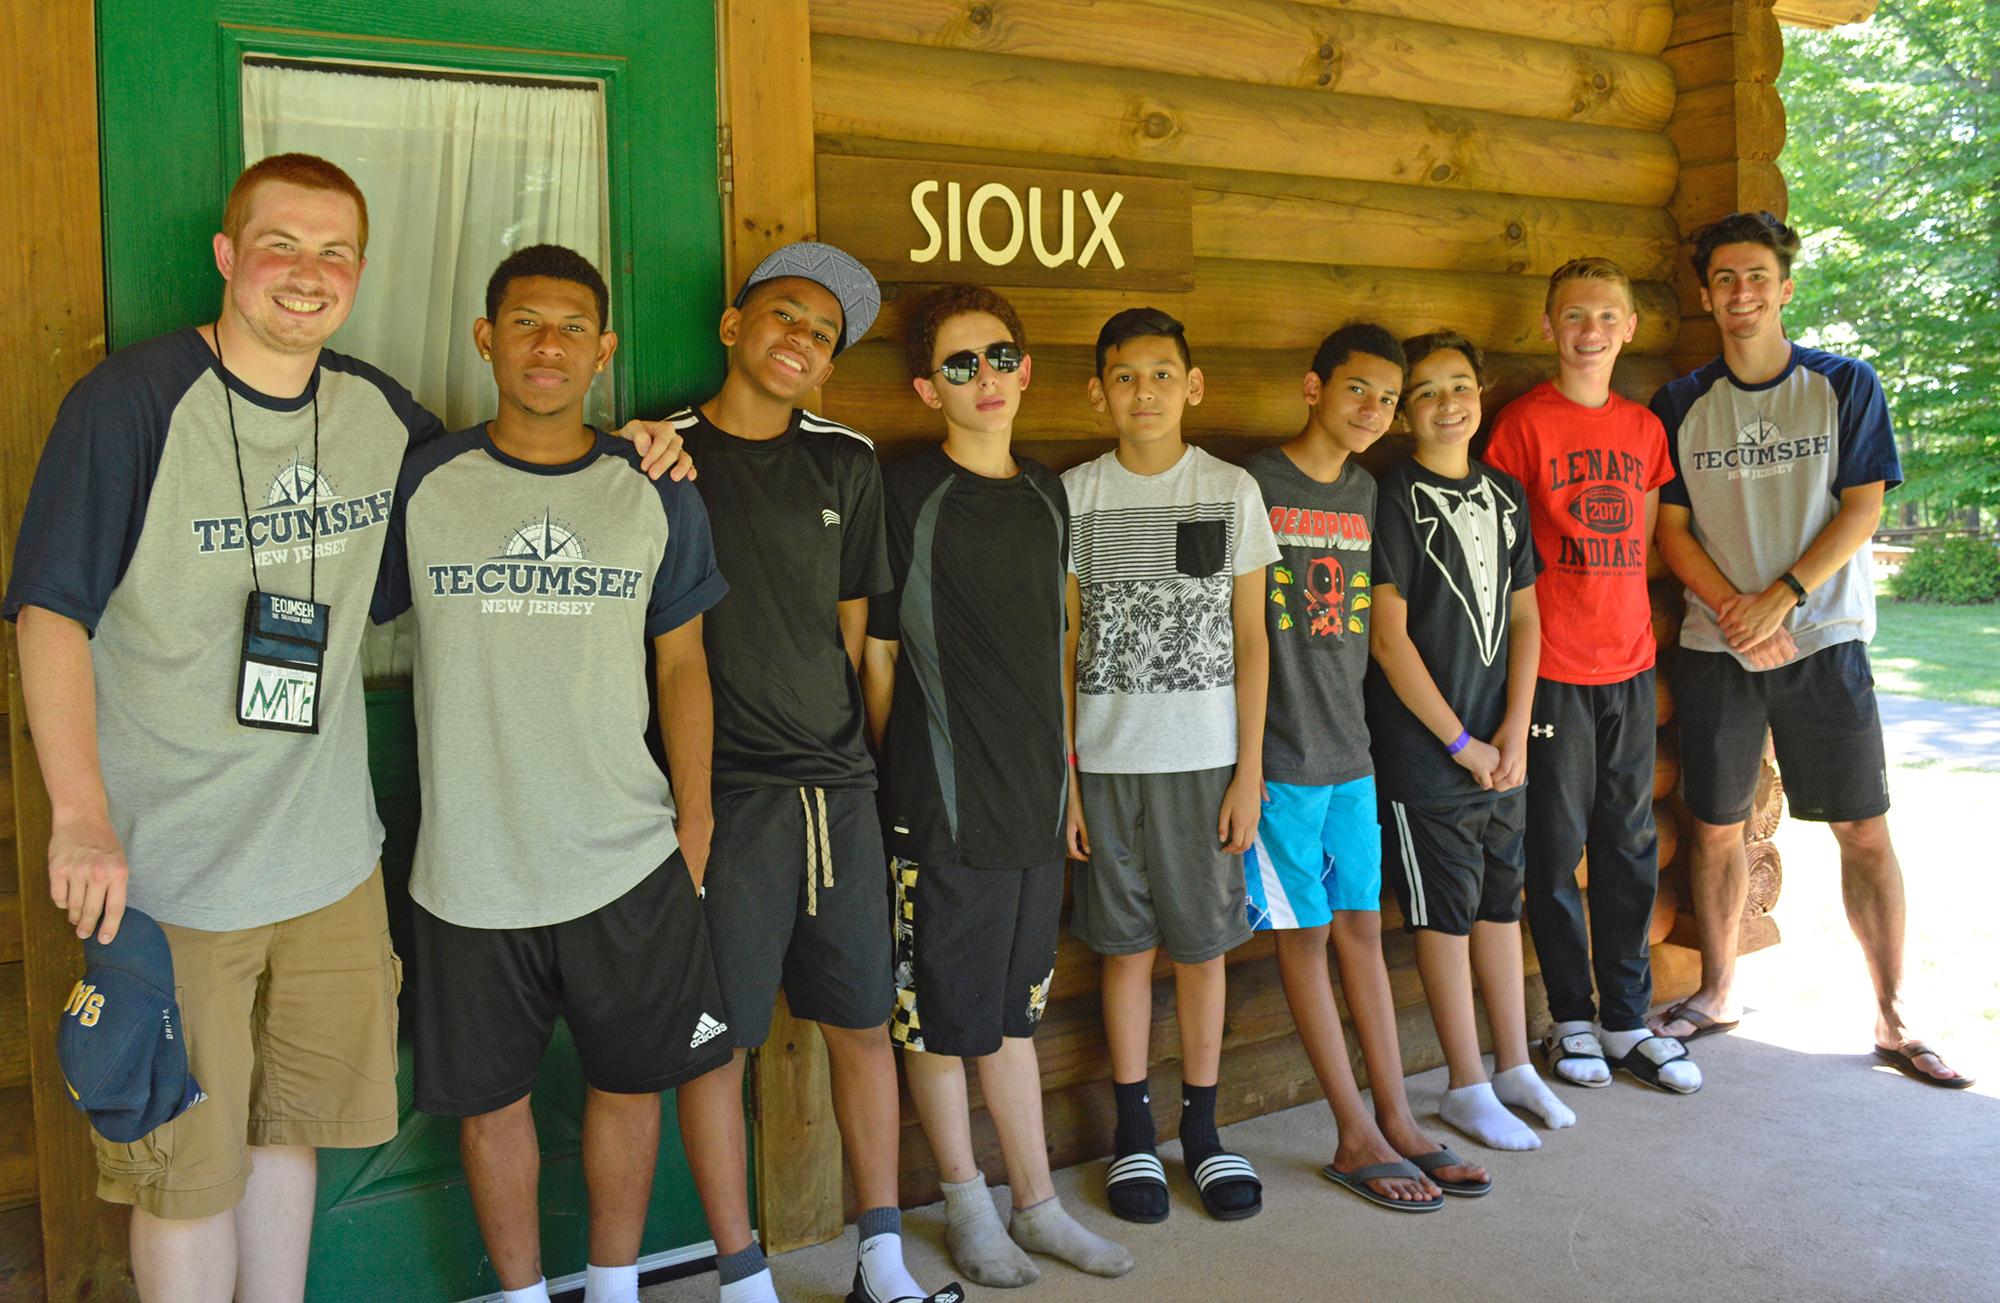 Cabins Camp Tecumseh